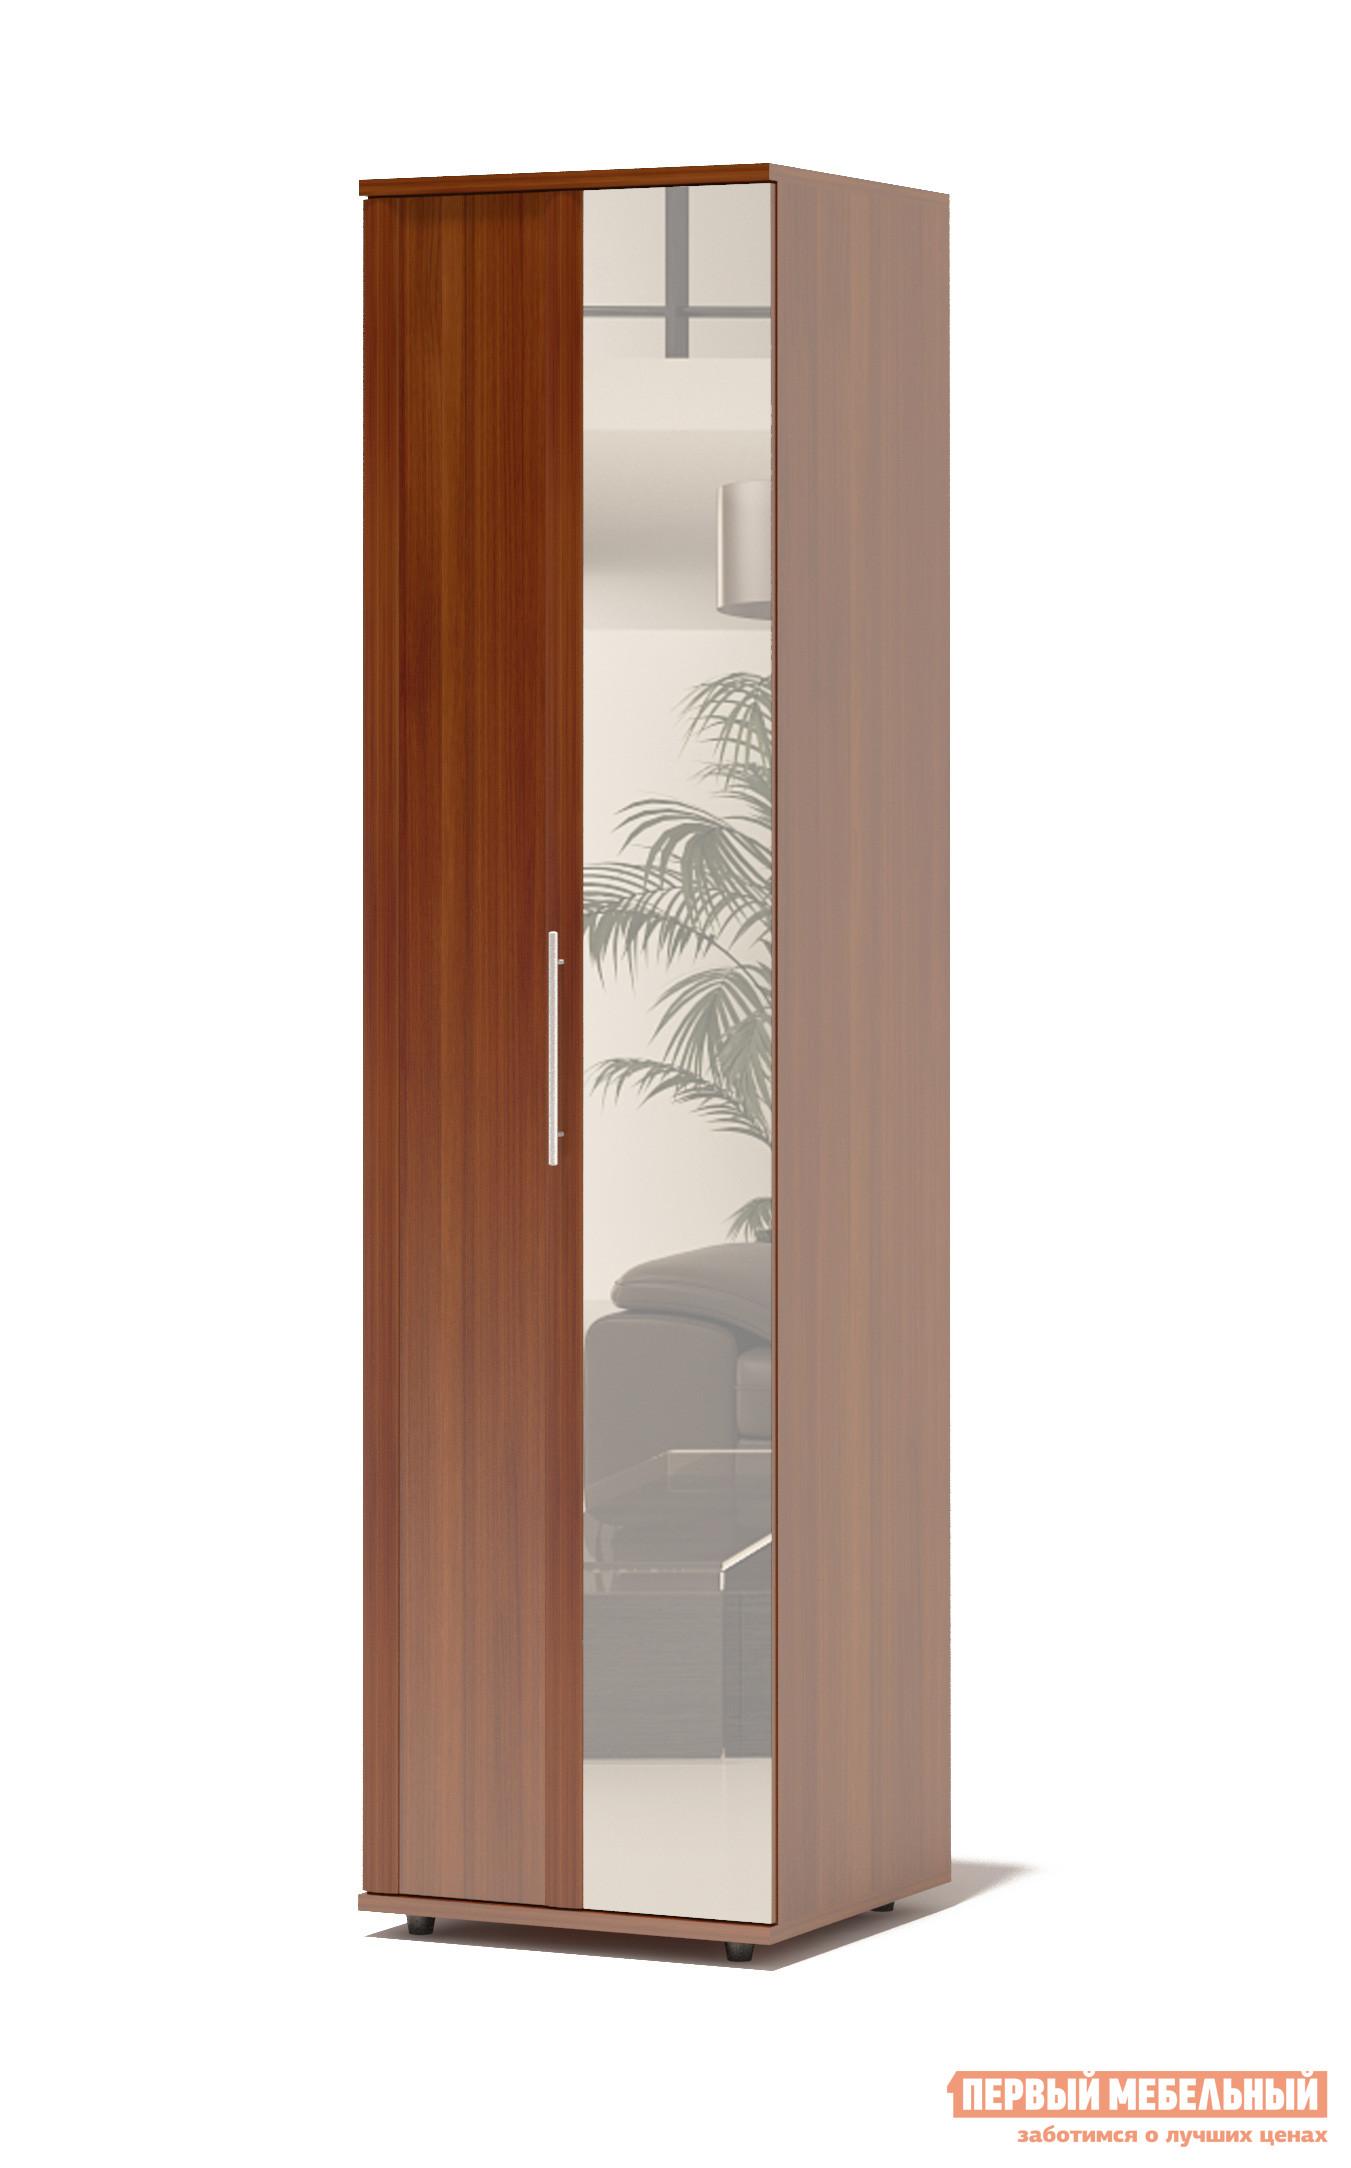 Шкаф-гармошка Сокол Маркес ШГ-206.2 Испанский орех, Правый